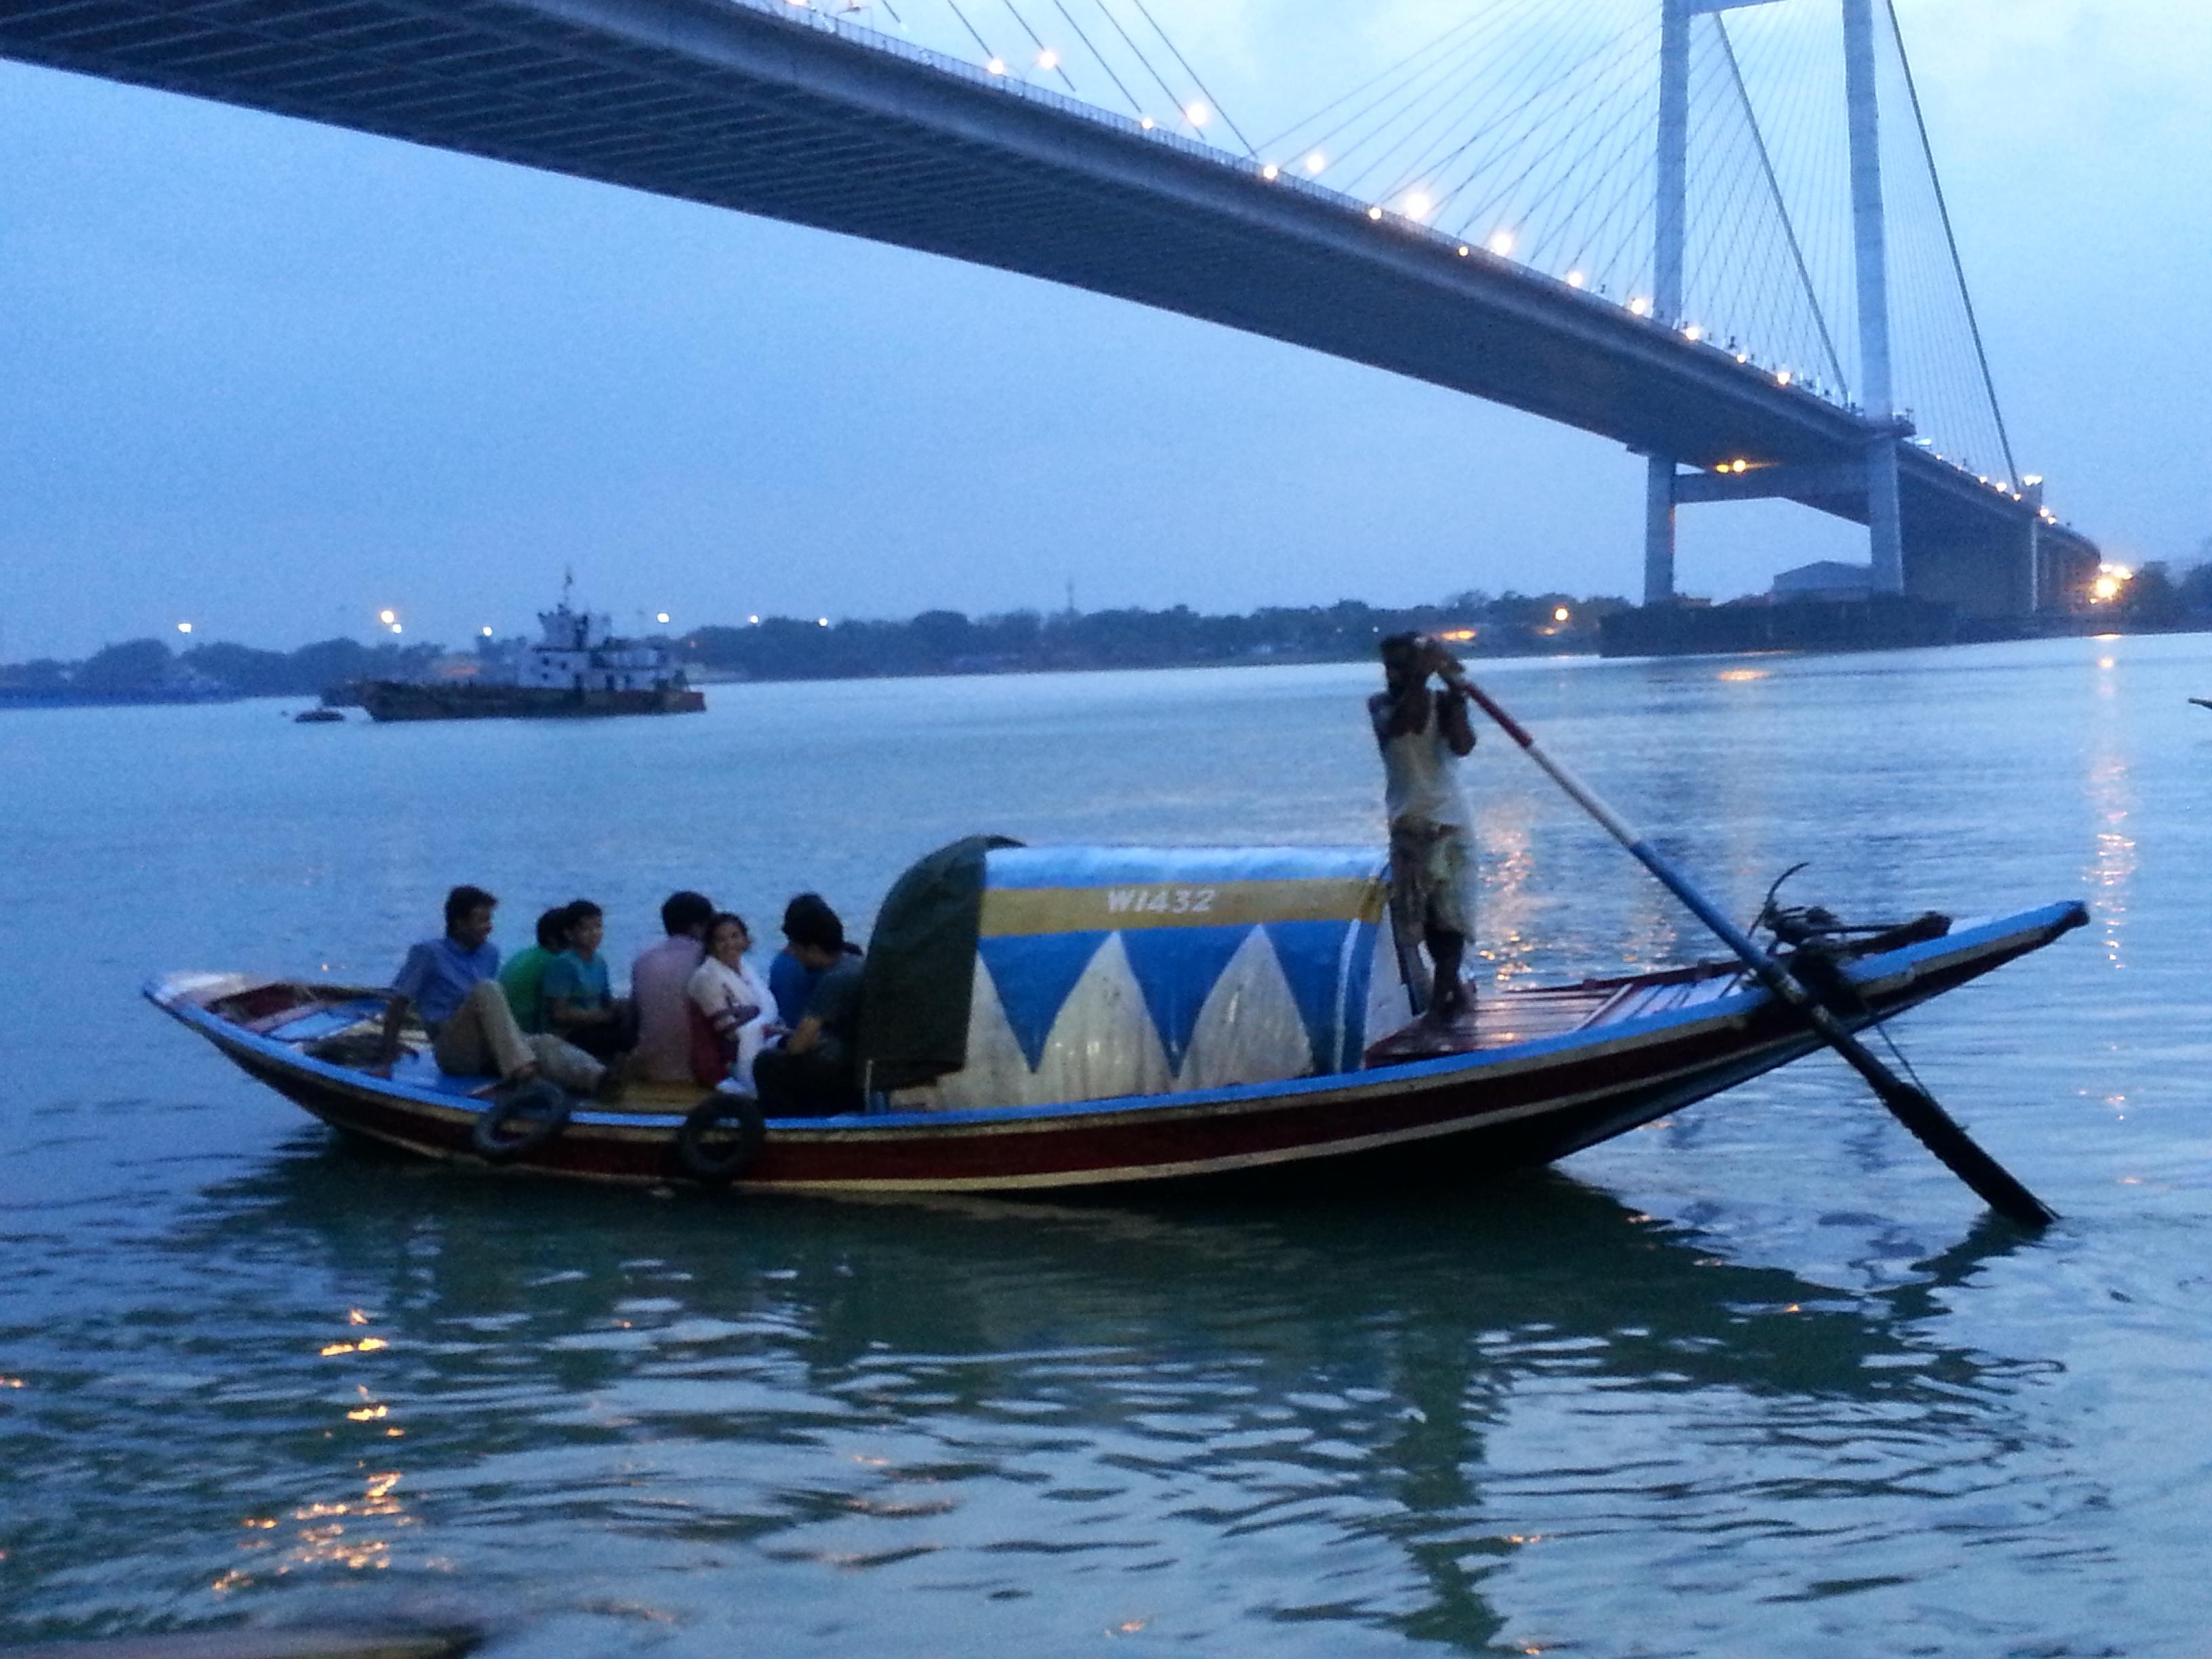 The travel diaries kolkata s waterways random for Boat fishing near me